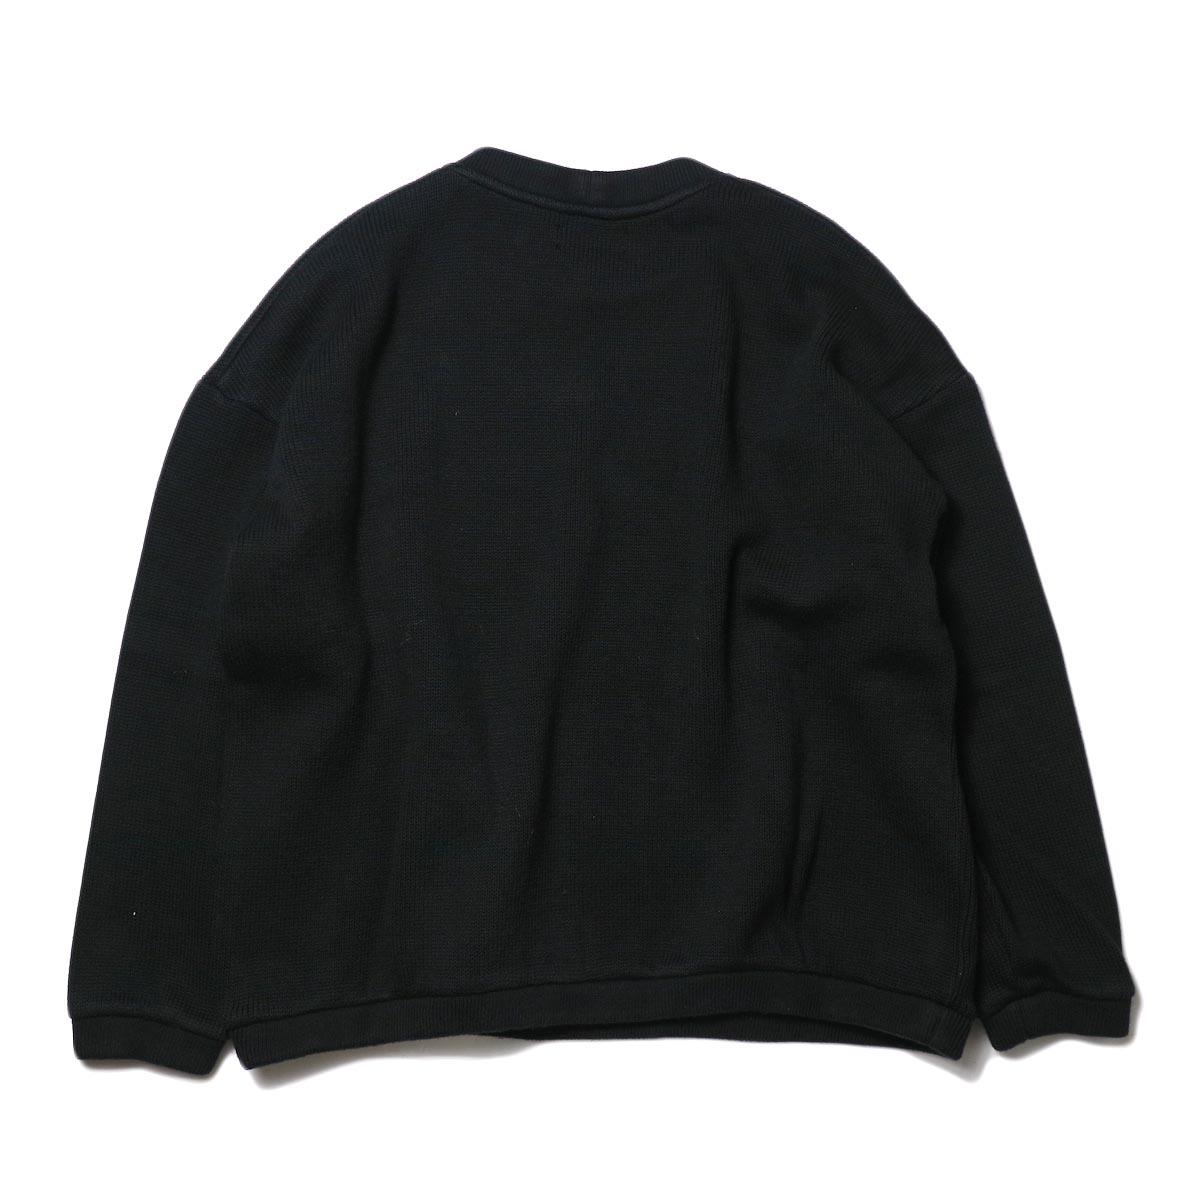 alvana / RIB KNIT CREWNECK P/O (Black) 背面